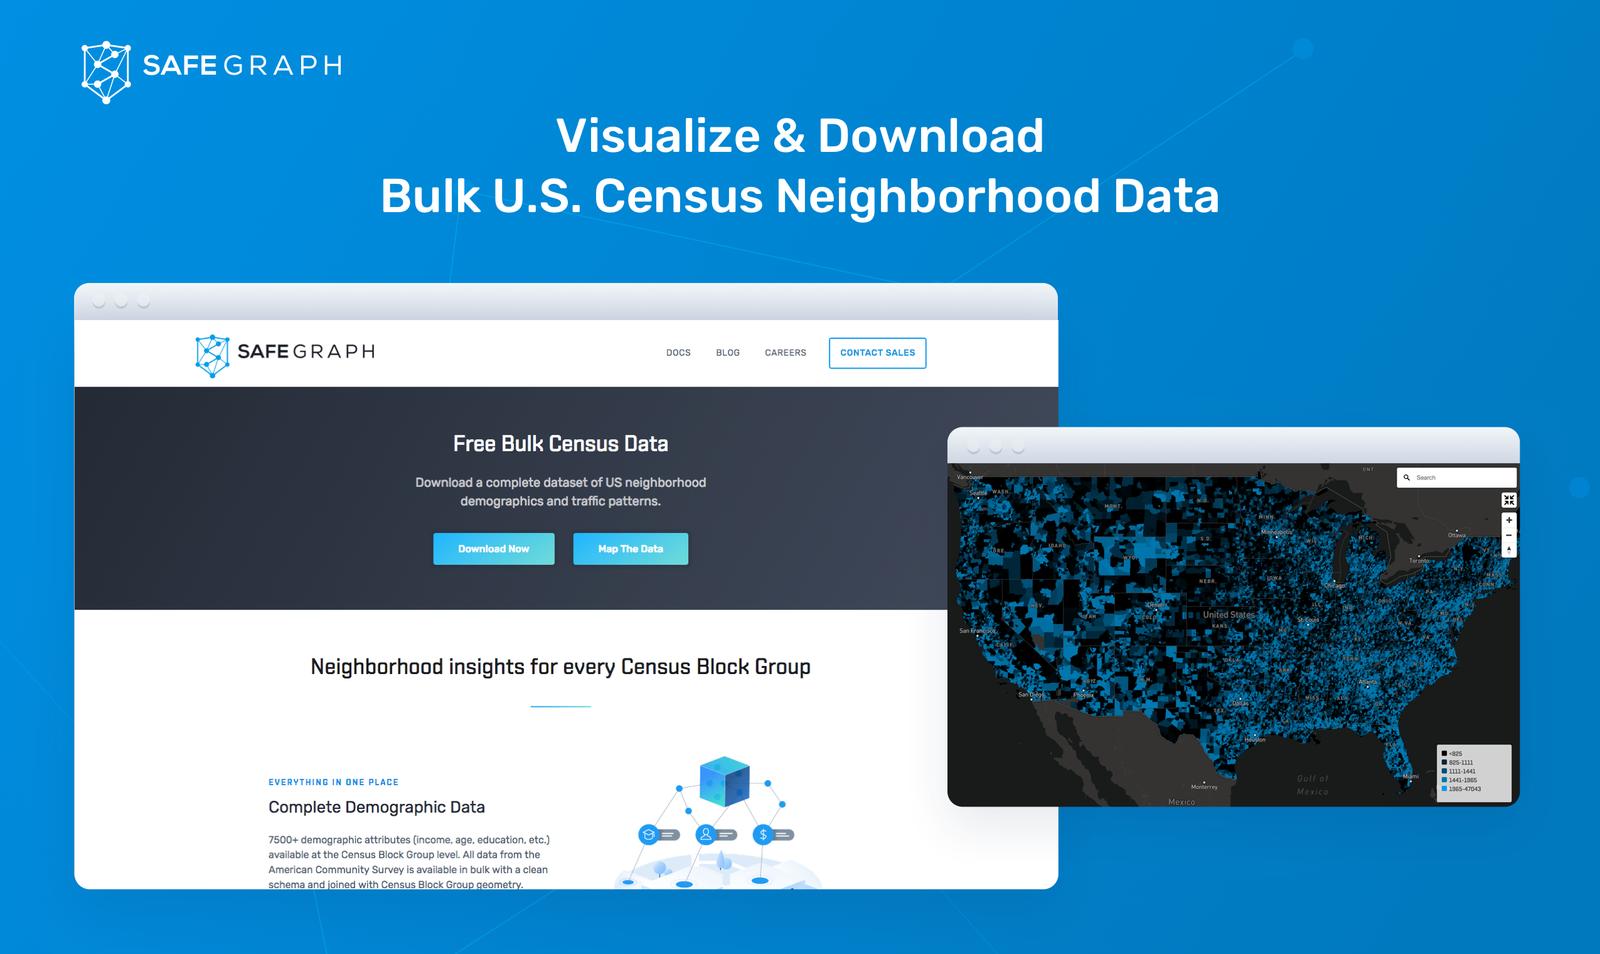 Open Census Data - Visualize & Download Neighborhood Demographic Insights